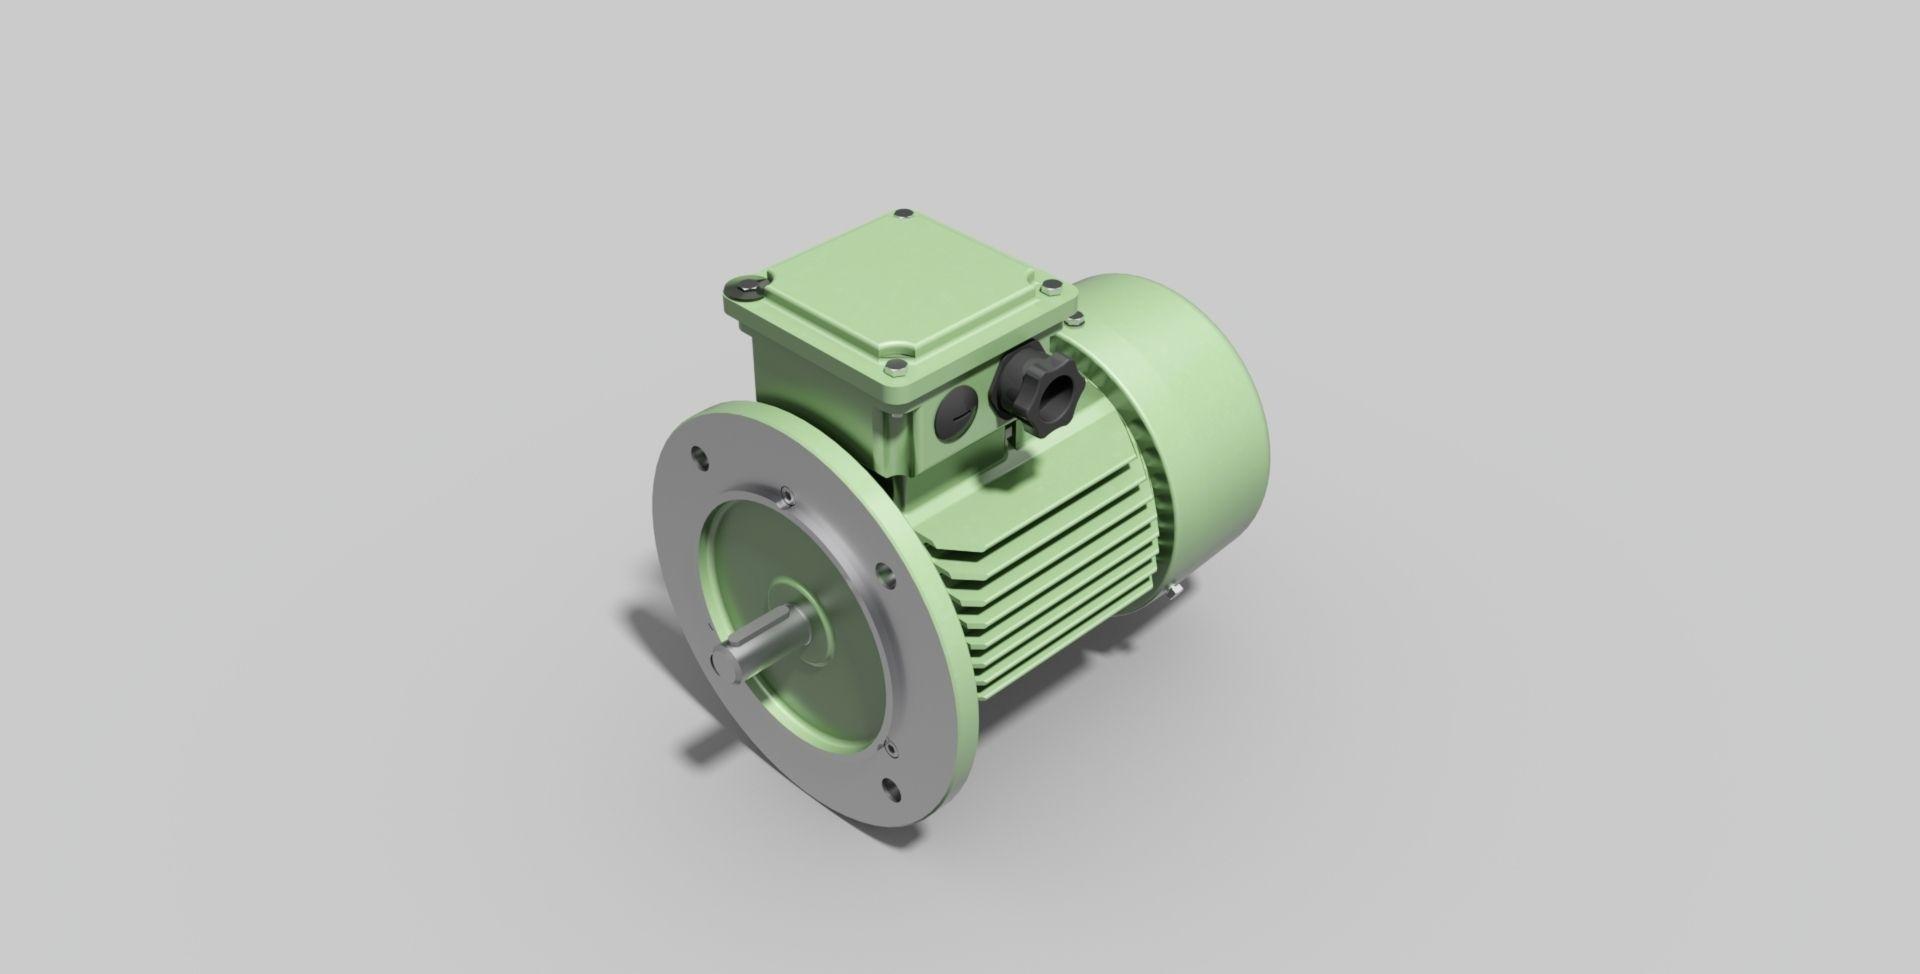 Iec80 B5 Electric Motor Free 3d Model Dwg Ipt Stp